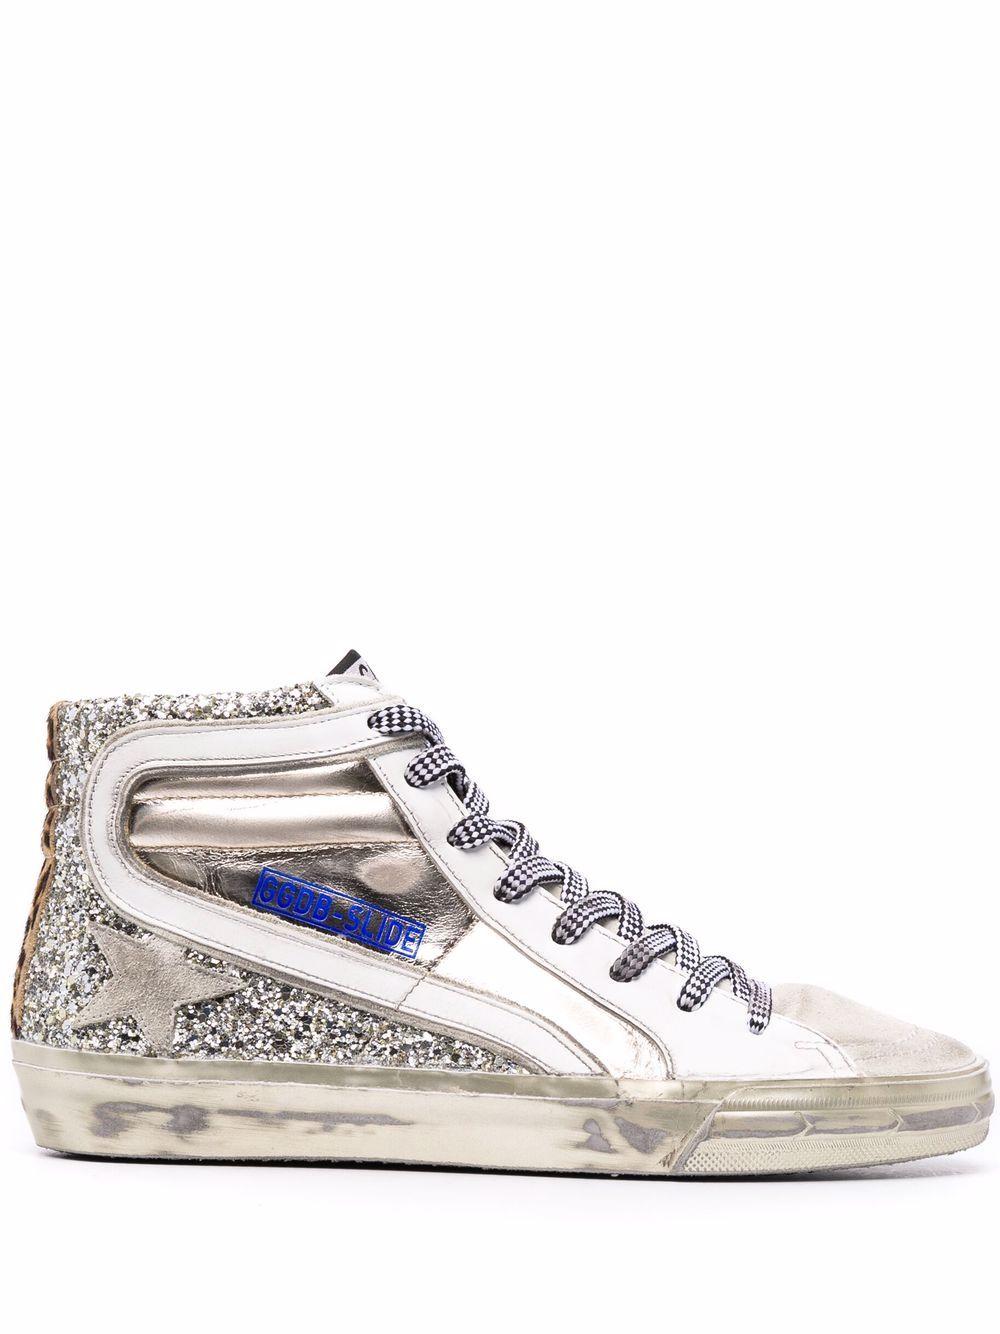 Picture of Golden Goose Deluxe Brand   Glitter Slide High Top Sneakers